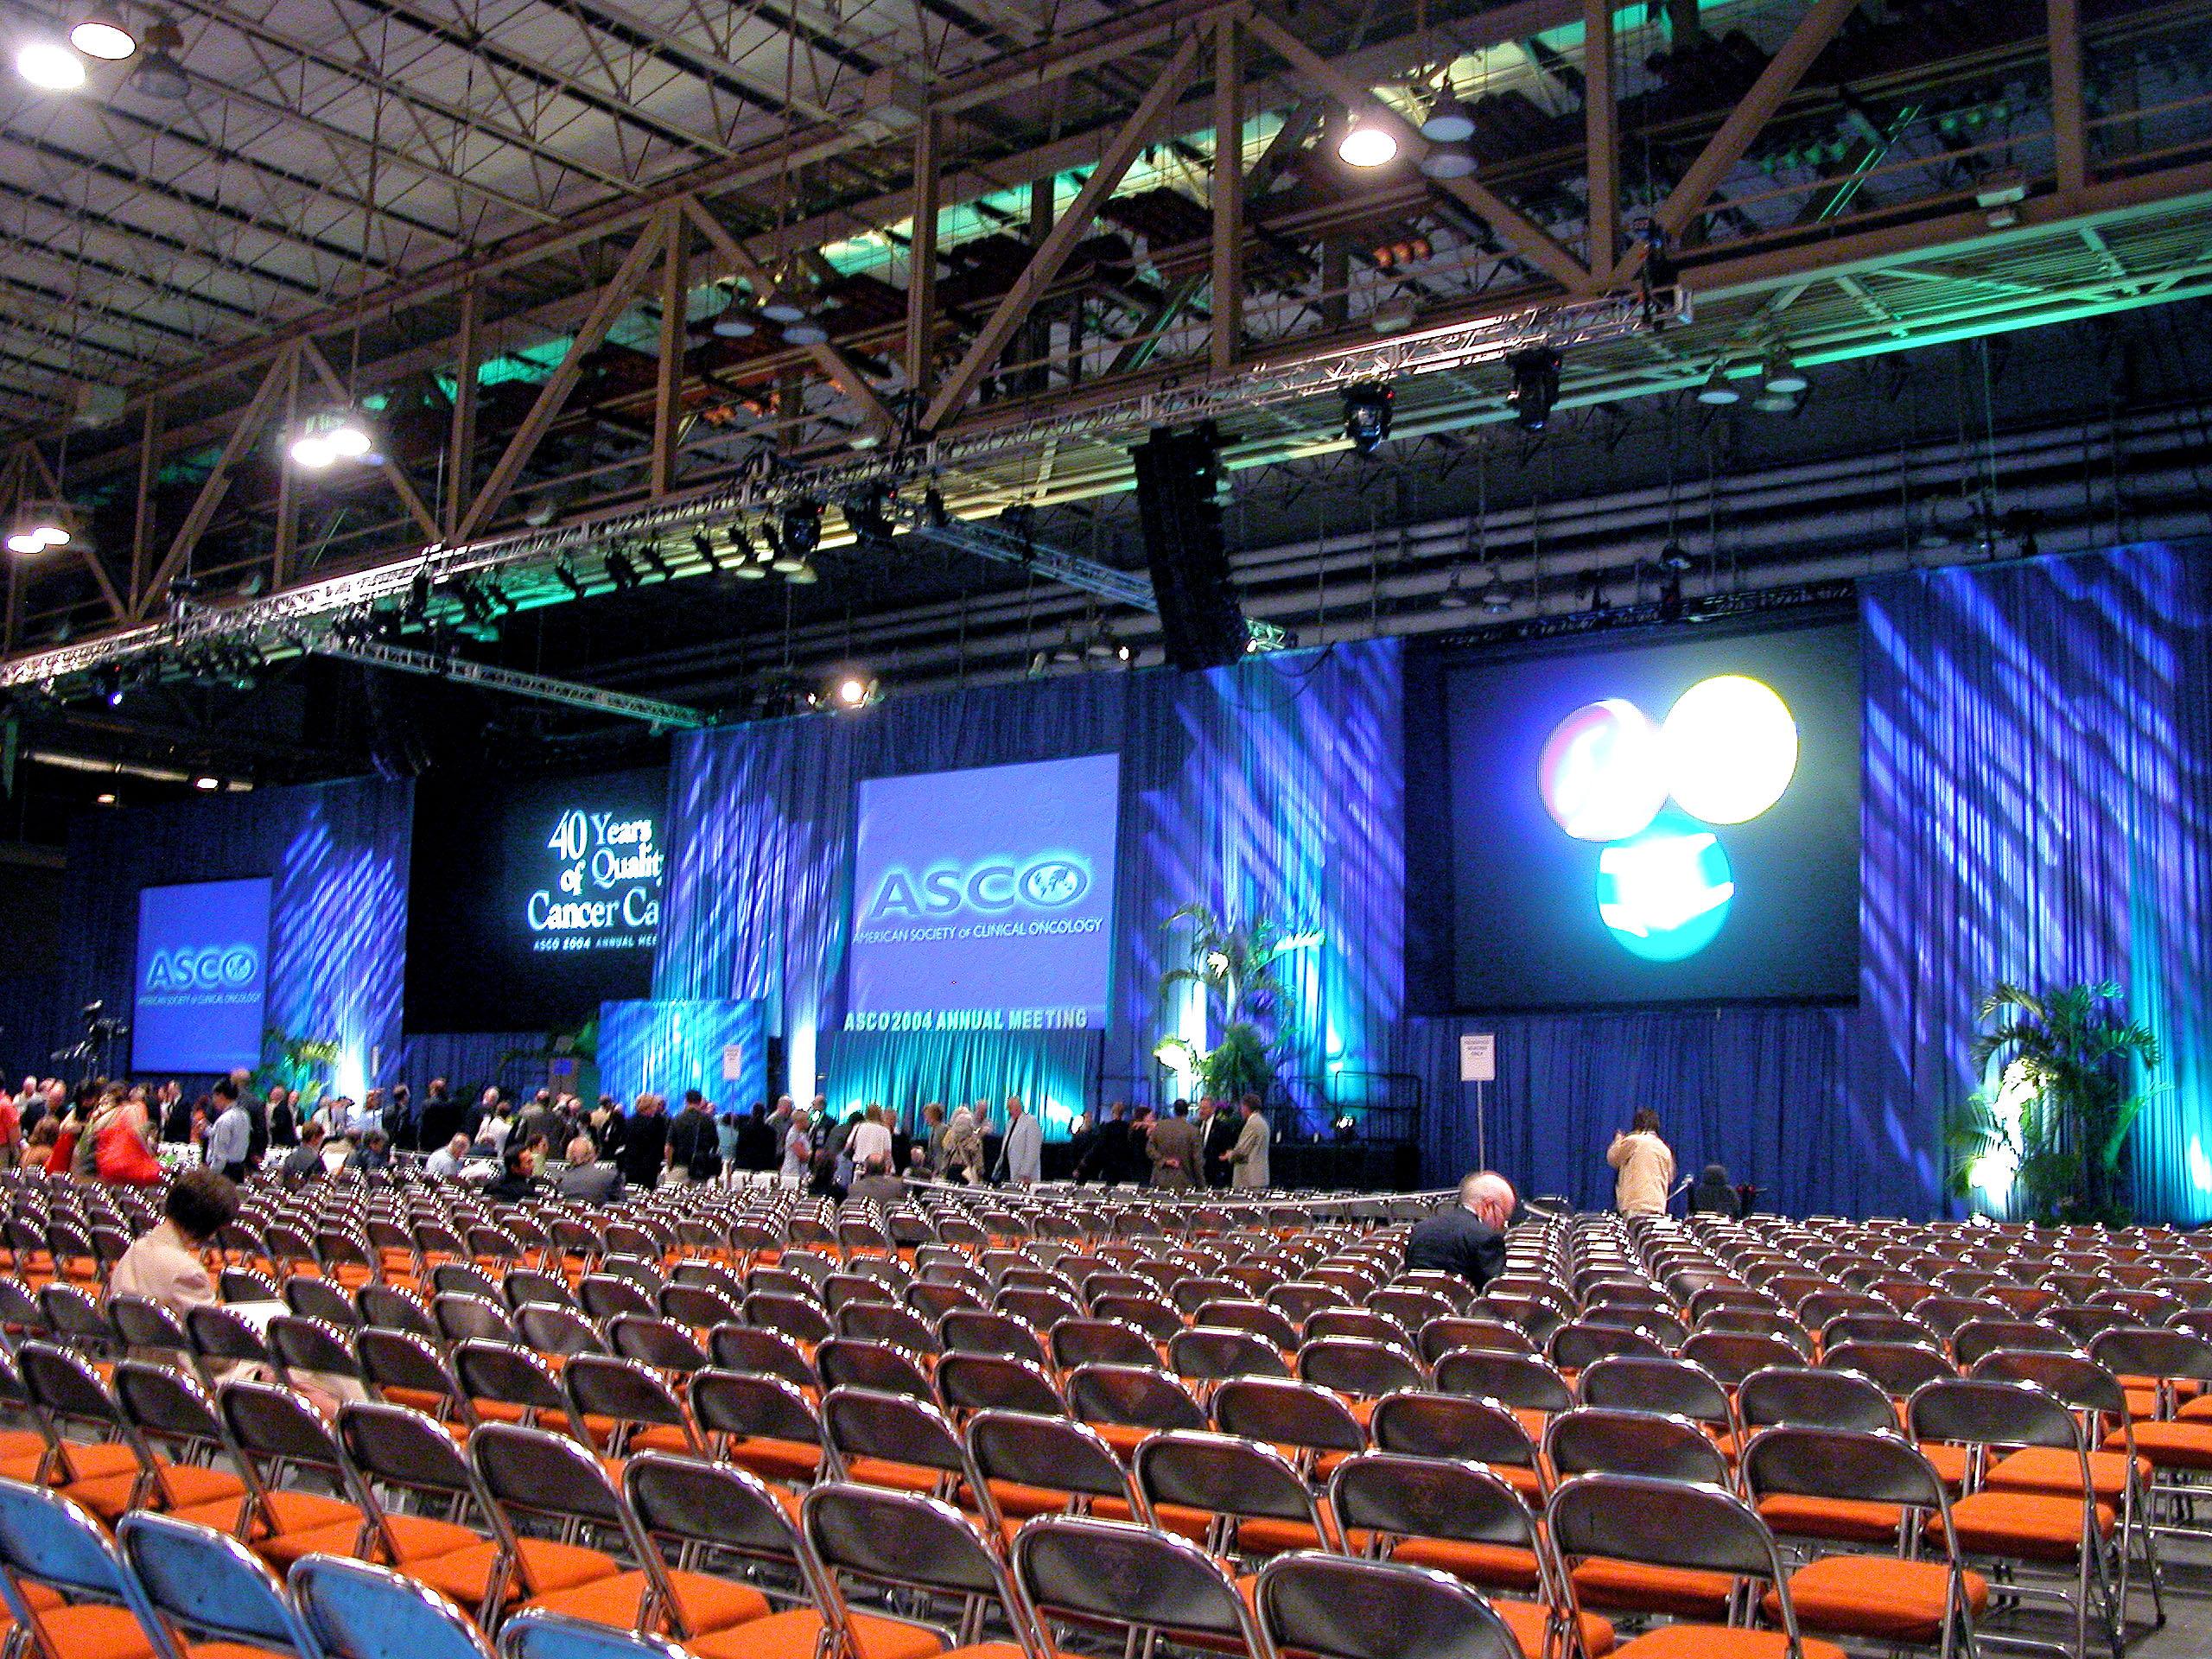 Vedecká konferencia (ilustračné foto)